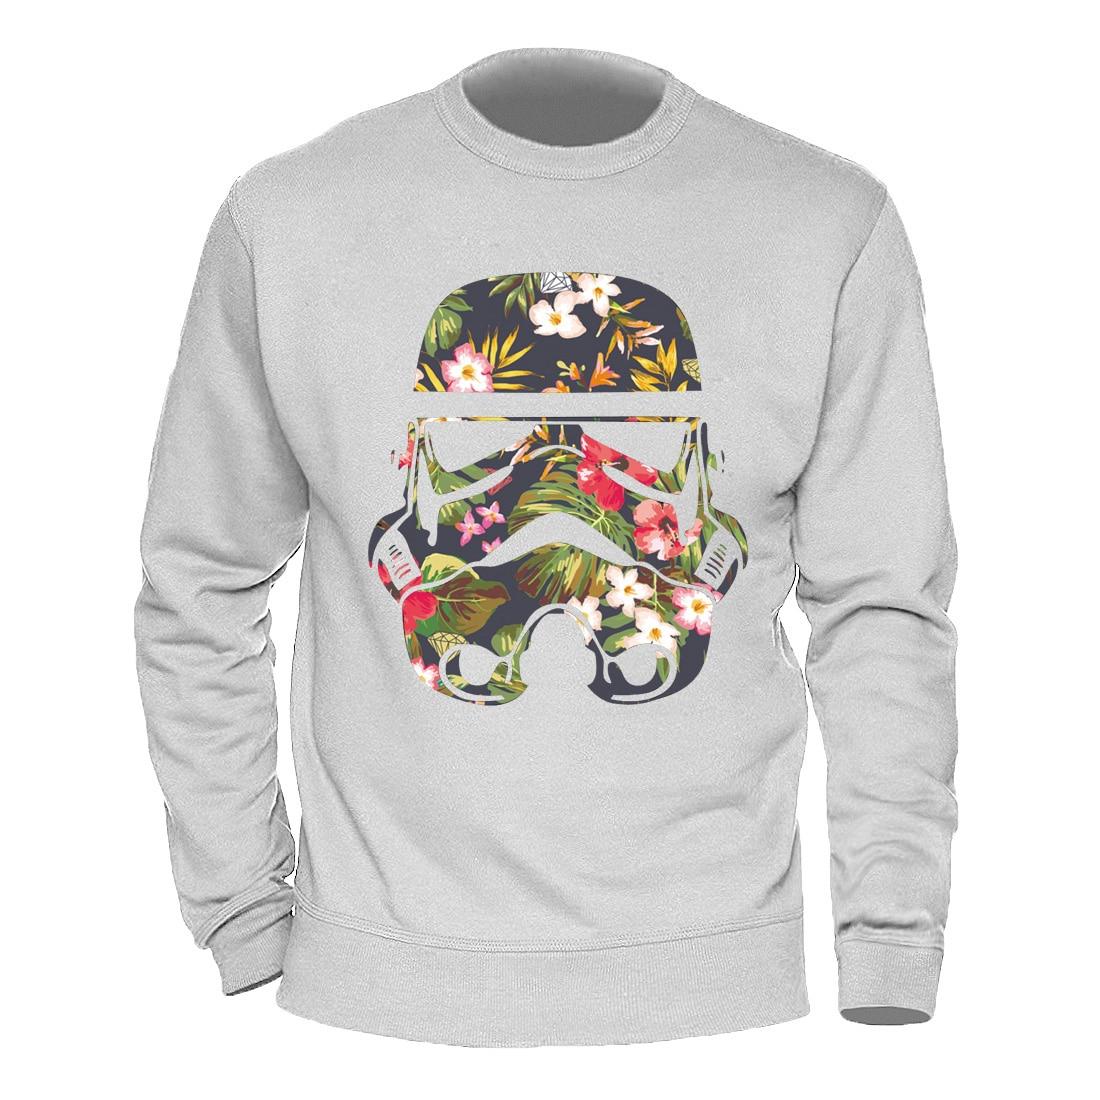 Men Casual Sweatshirt Men's Winter Clothing Cartoon Star Wars 2020 Hot Print Man Fashion Hoodies O-neck Pullover Tops Clothing